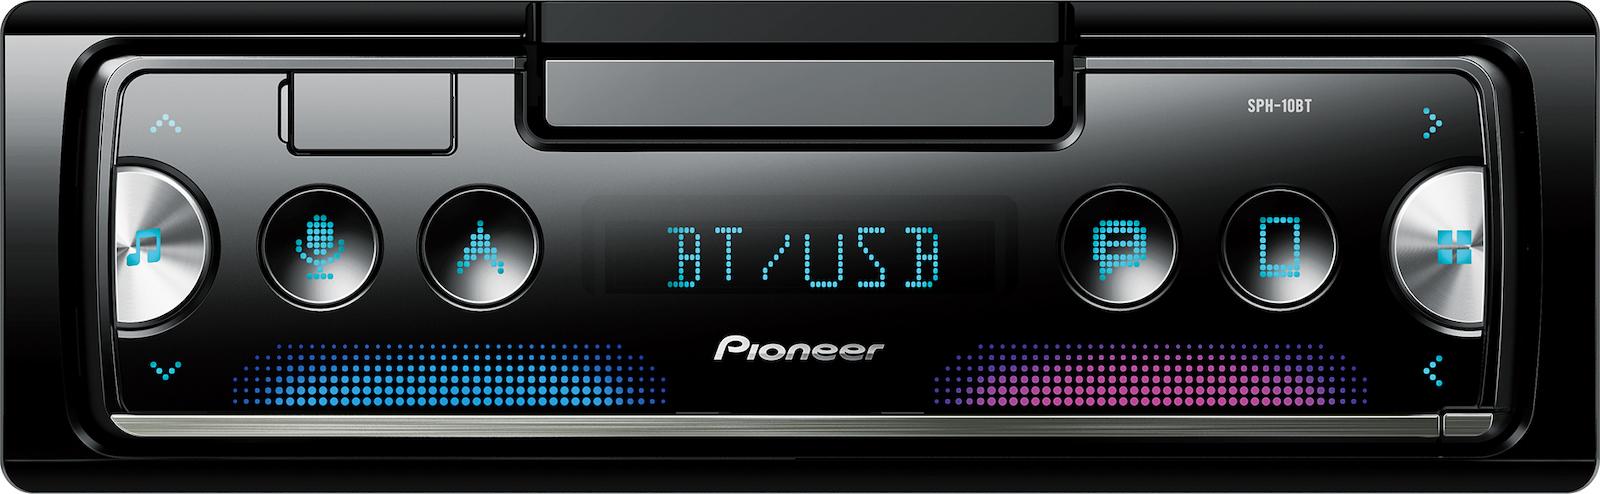 Pioneer SPH-10BT New  radio usb/BT/smart phone